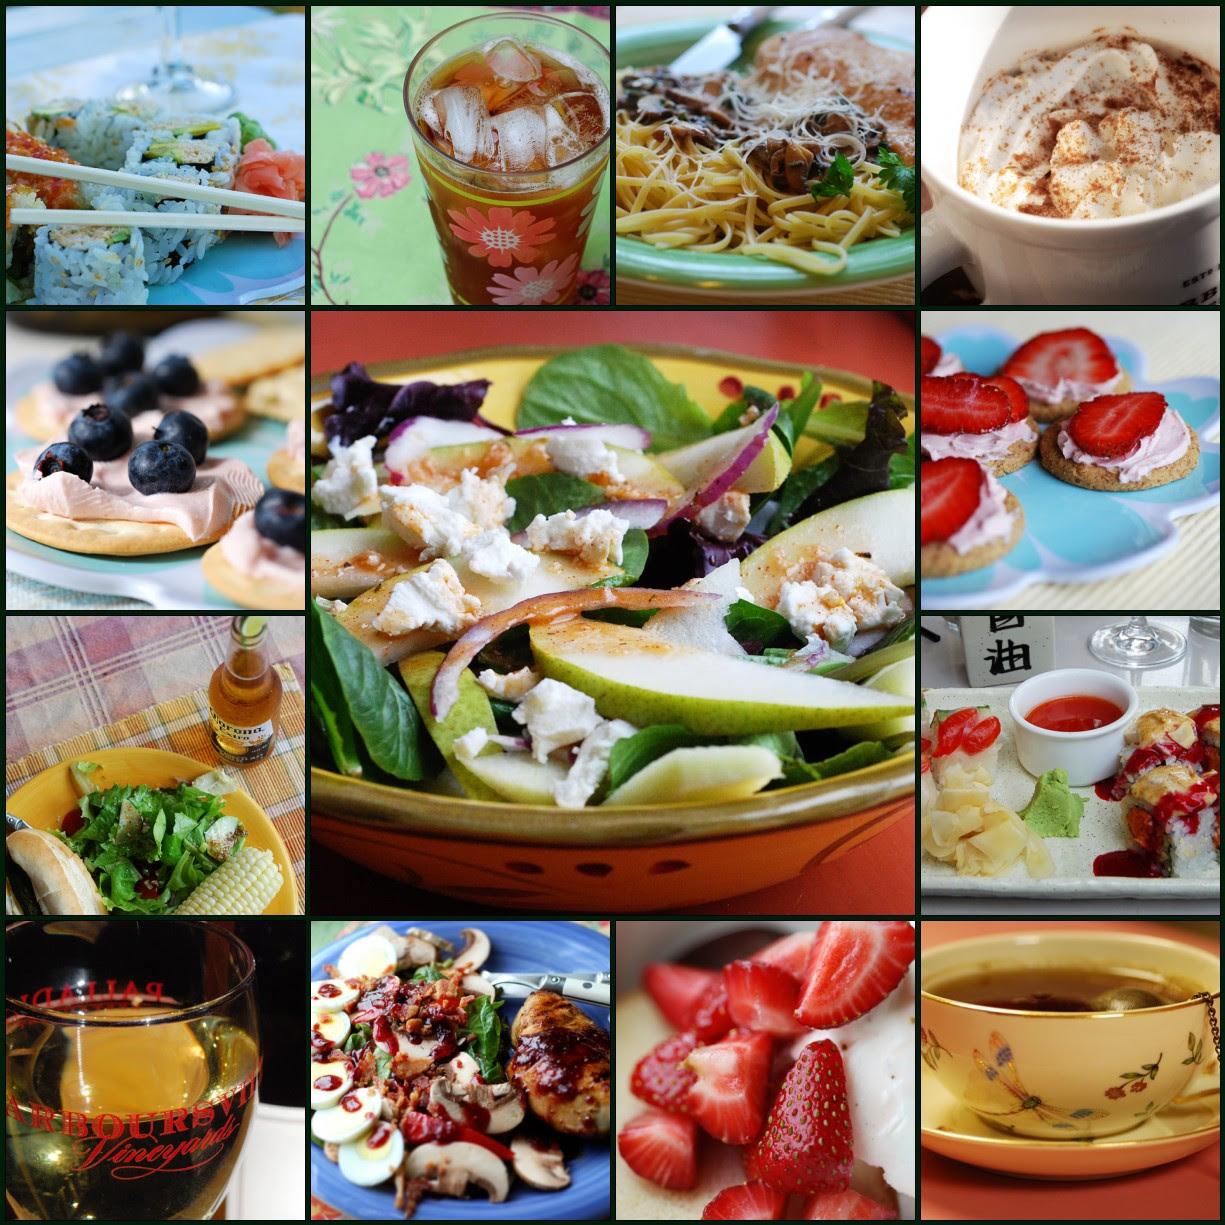 Mosaic Monday: Food & Drink